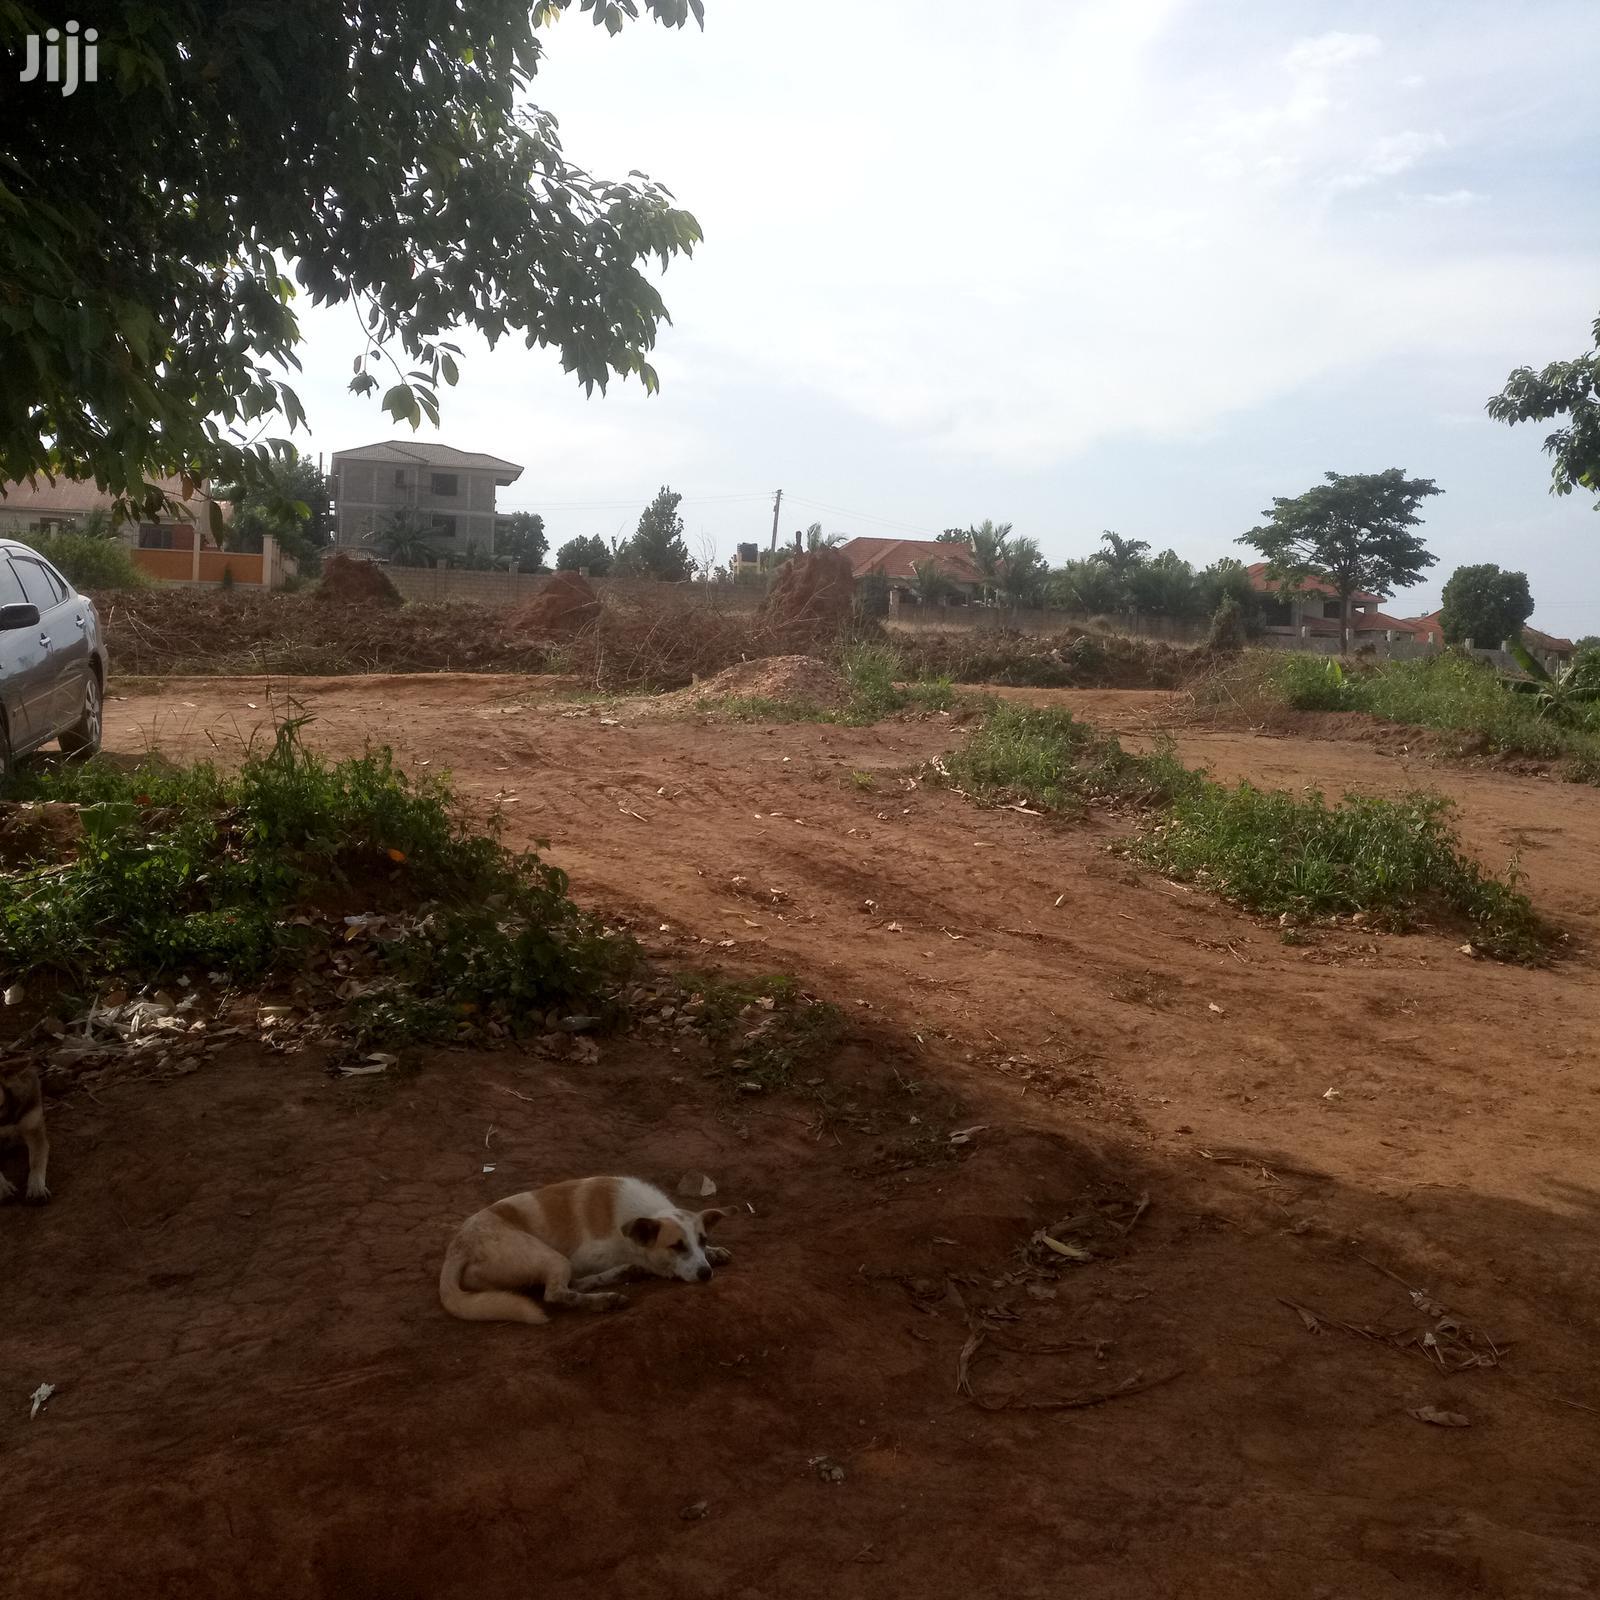 50x100ft Plot Of Land In Namugongo For Sale | Land & Plots For Sale for sale in Kampala, Central Region, Uganda